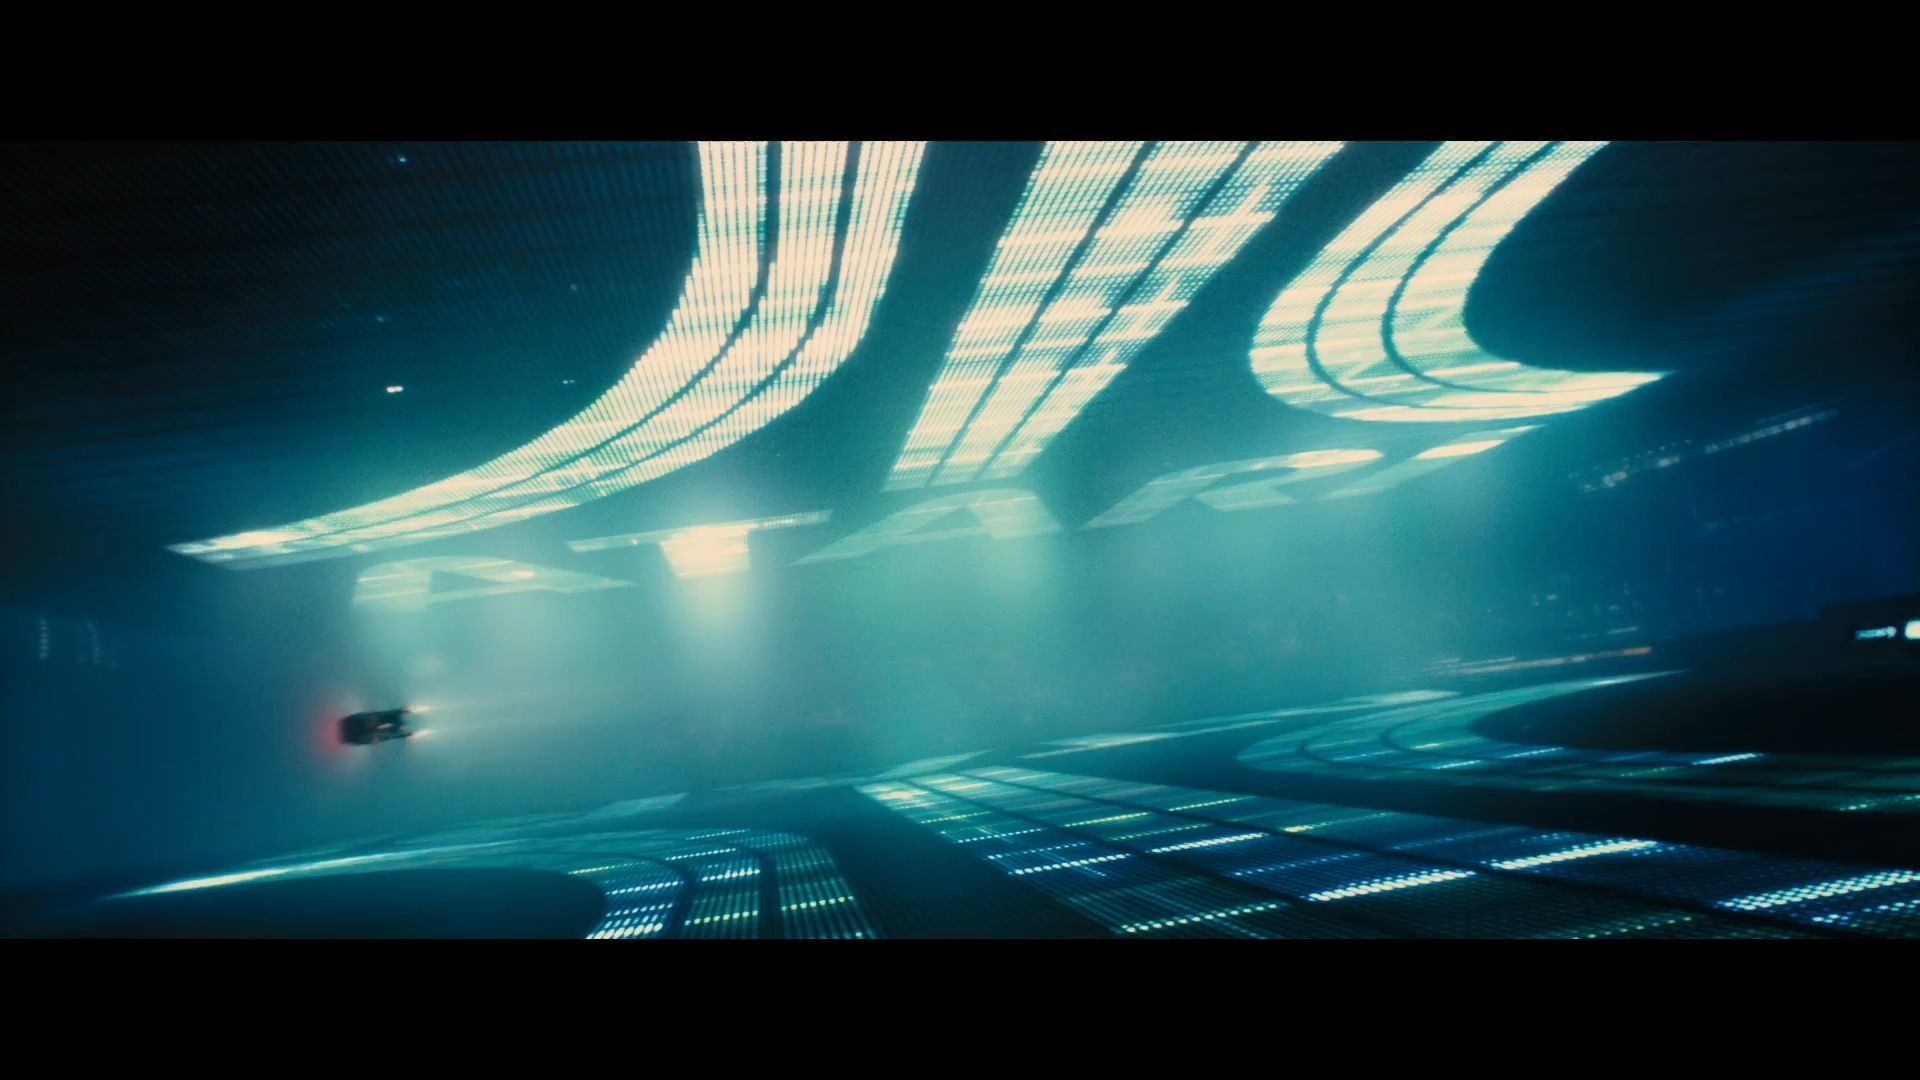 1920x769 Blade Runner 2049 Hd Background Blade Runner 2049 Blade Runner Blade Runner Wallpaper